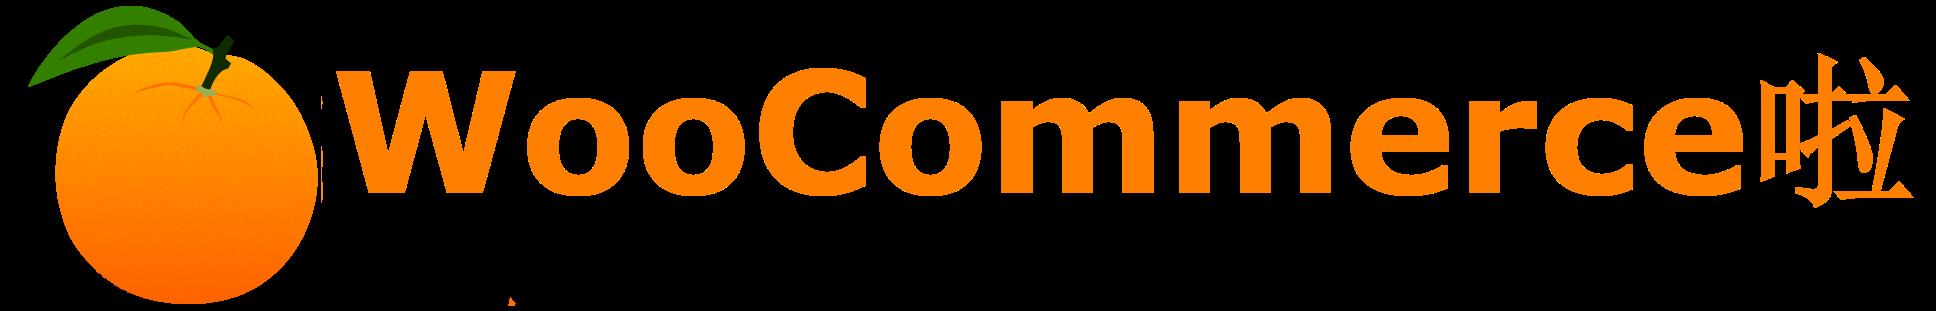 WordPress自助建站简易教程- WooCommerce啦| WordPress啦| WooCommerce怎么样| WooCommerce免费版视频教程